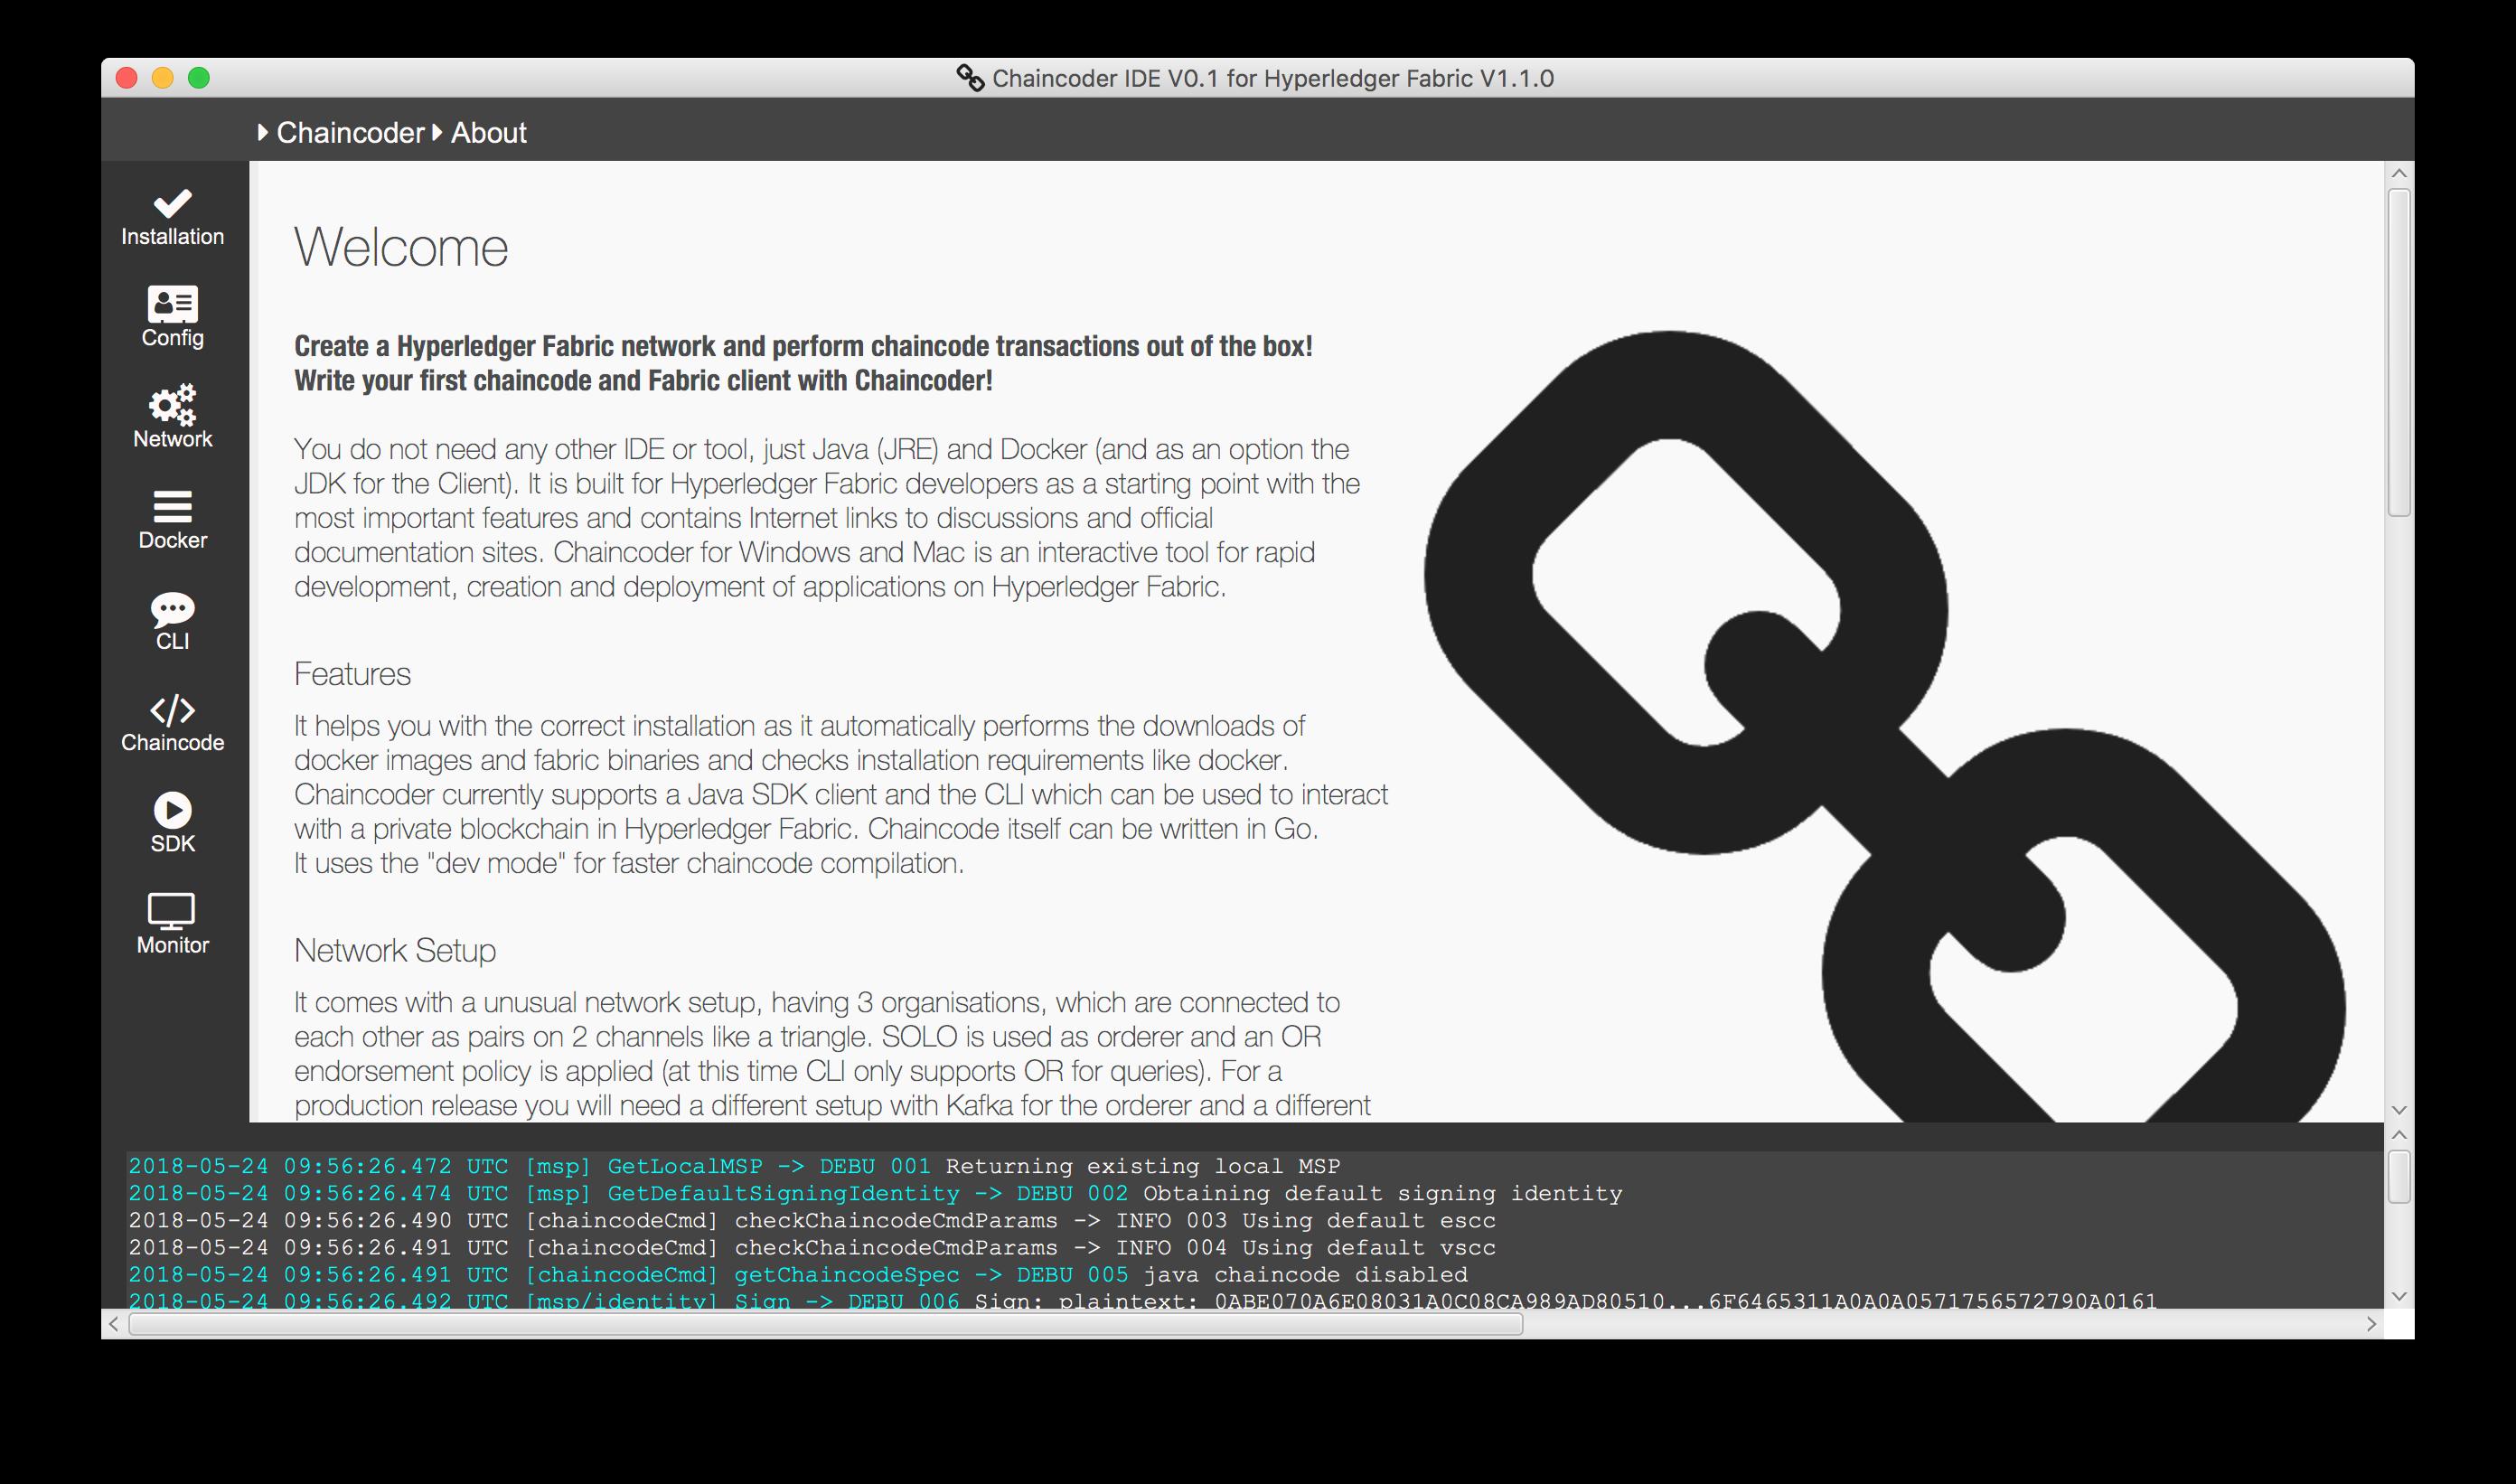 Chaincoder - IDE for Hyperledger Fabric